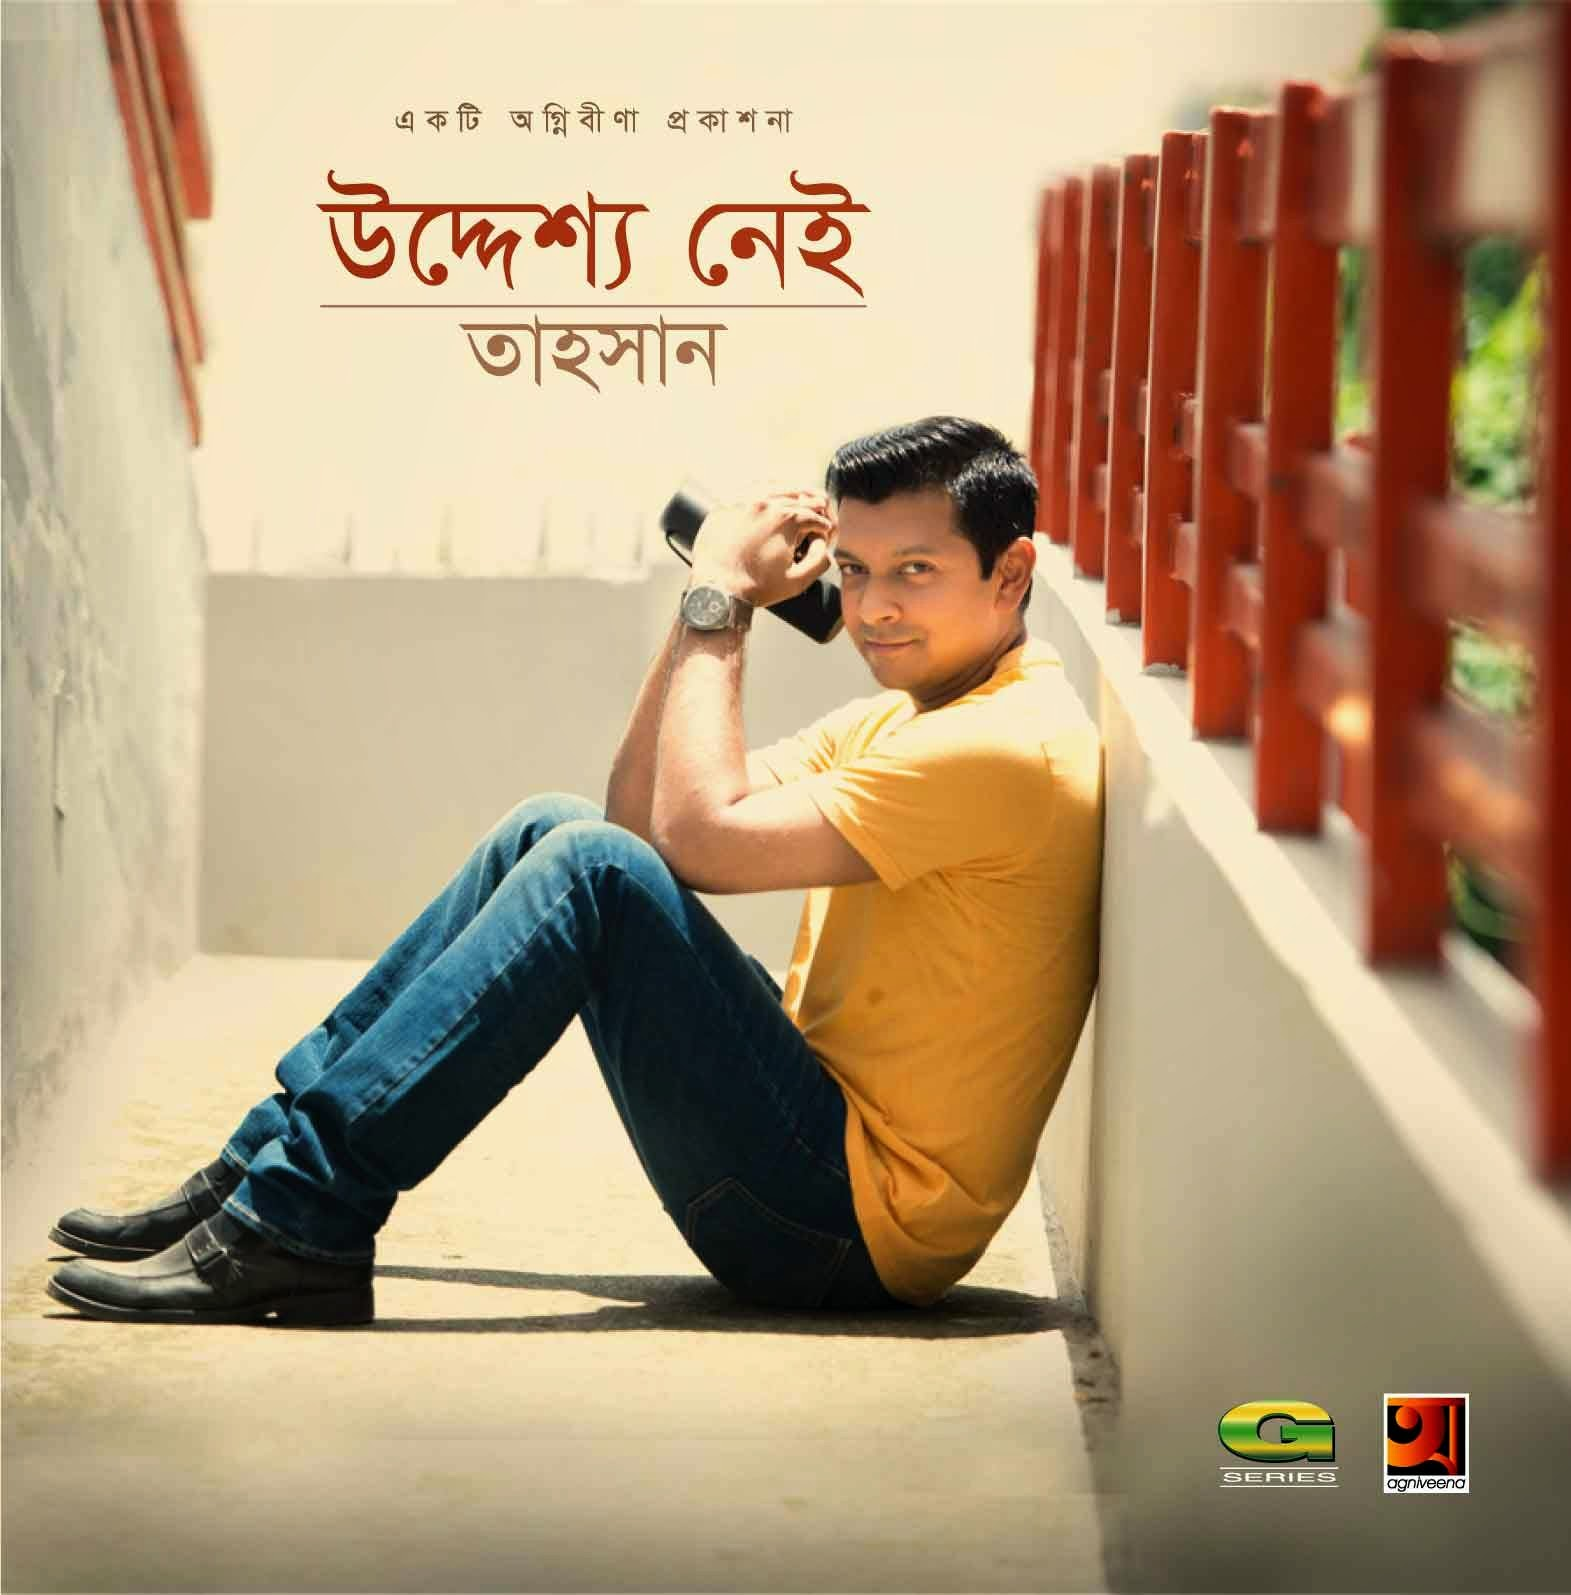 Ami Ki Tomay Songs Download: [Uddessho Nei]- By Tahsan (2014) Full Mp3 Album Songs